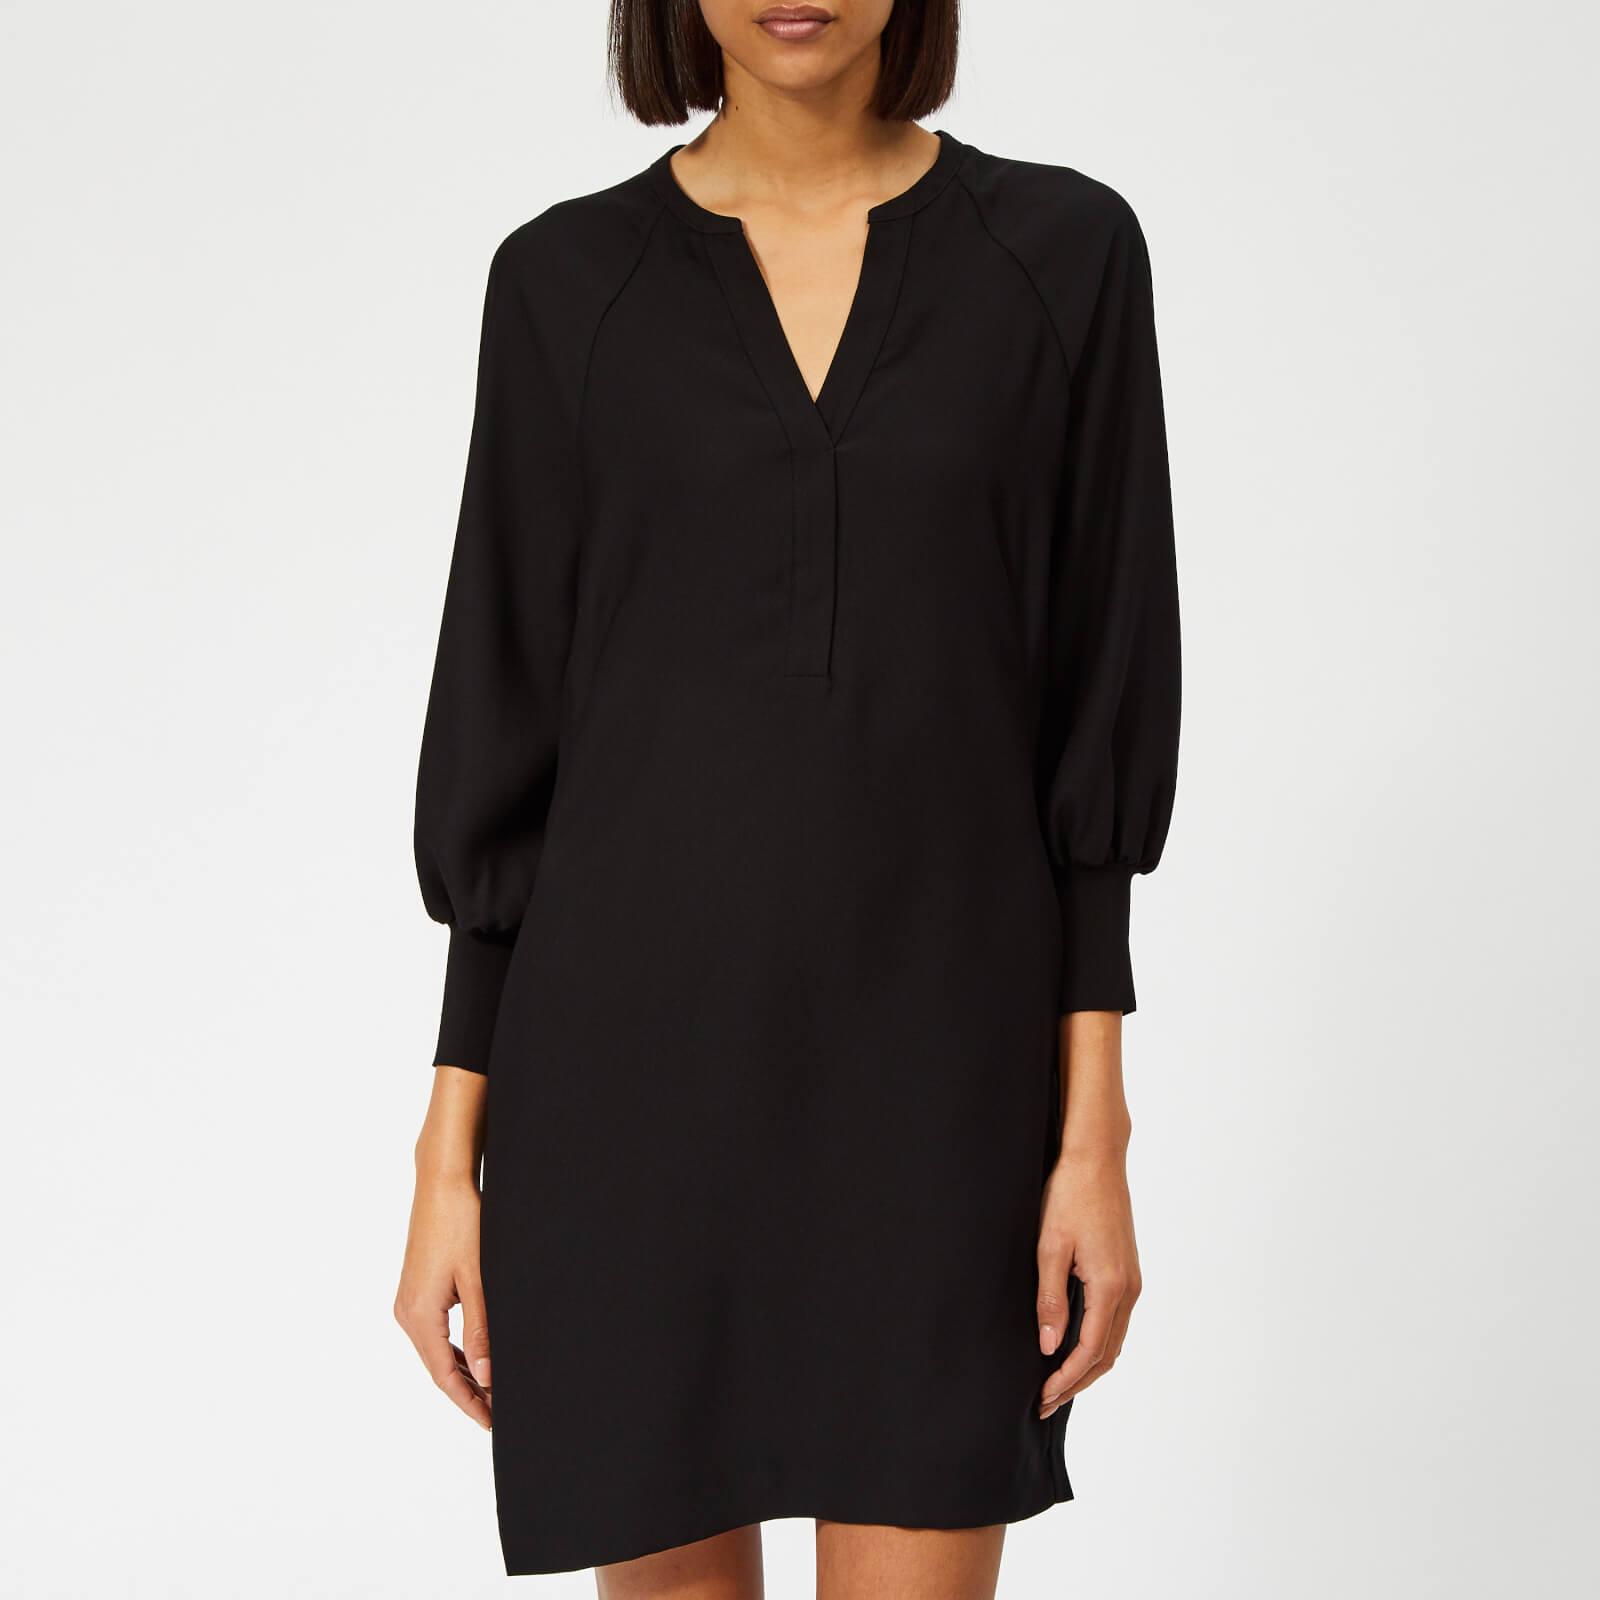 Whistles Women's Zeta Ribbed Cuff Crepe Dress - Black - UK 8 - Black